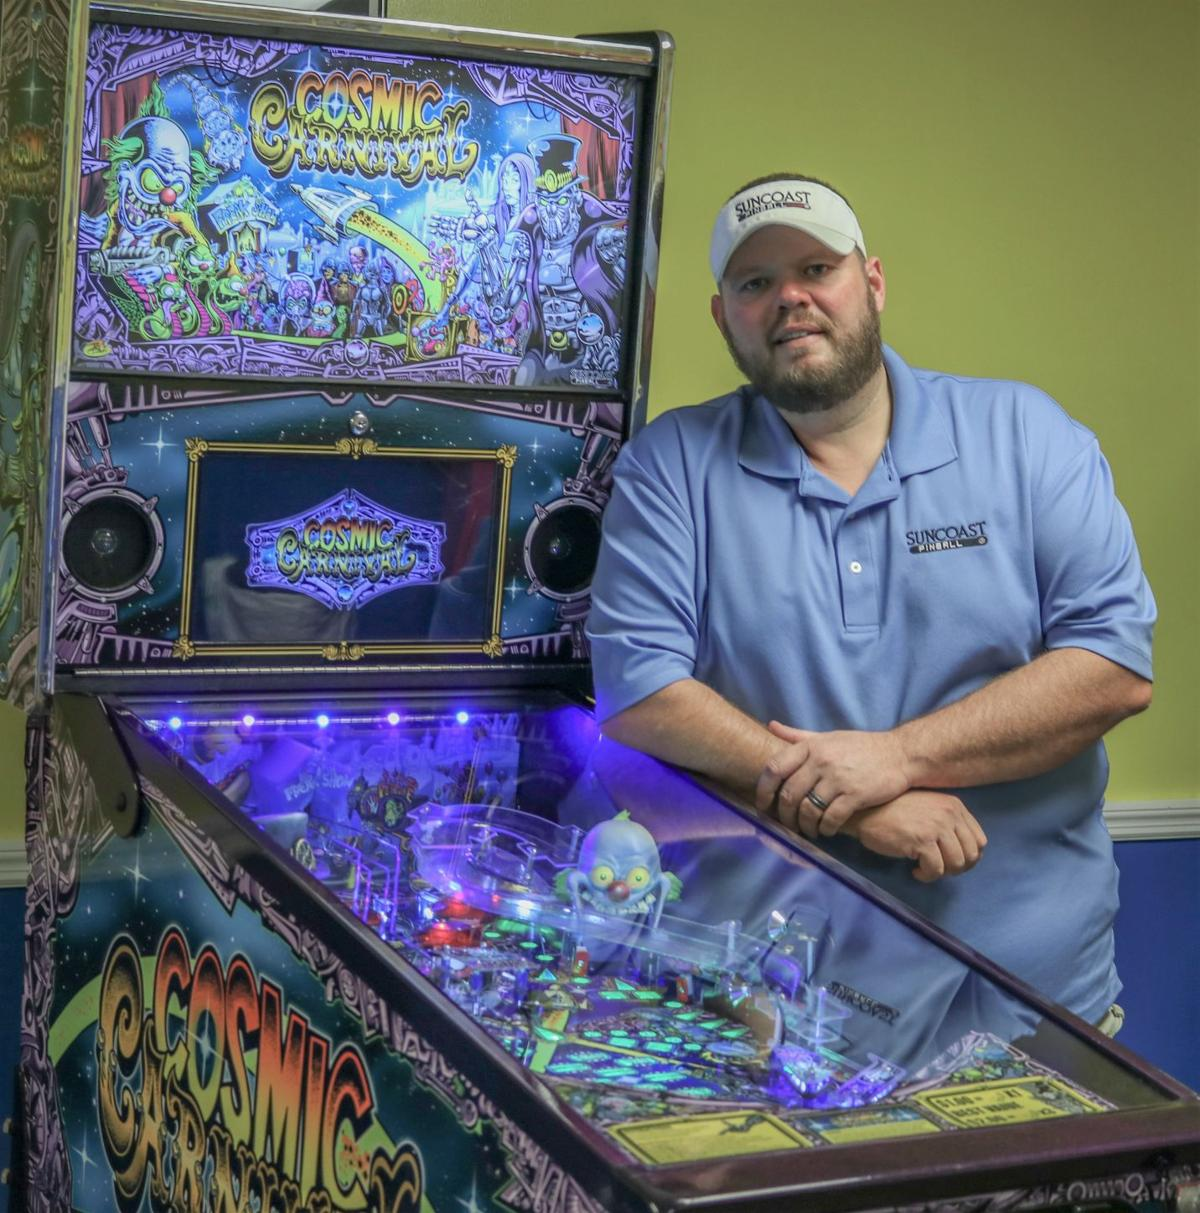 Largo's Suncoast Pinball & Arcade rolls out first original game